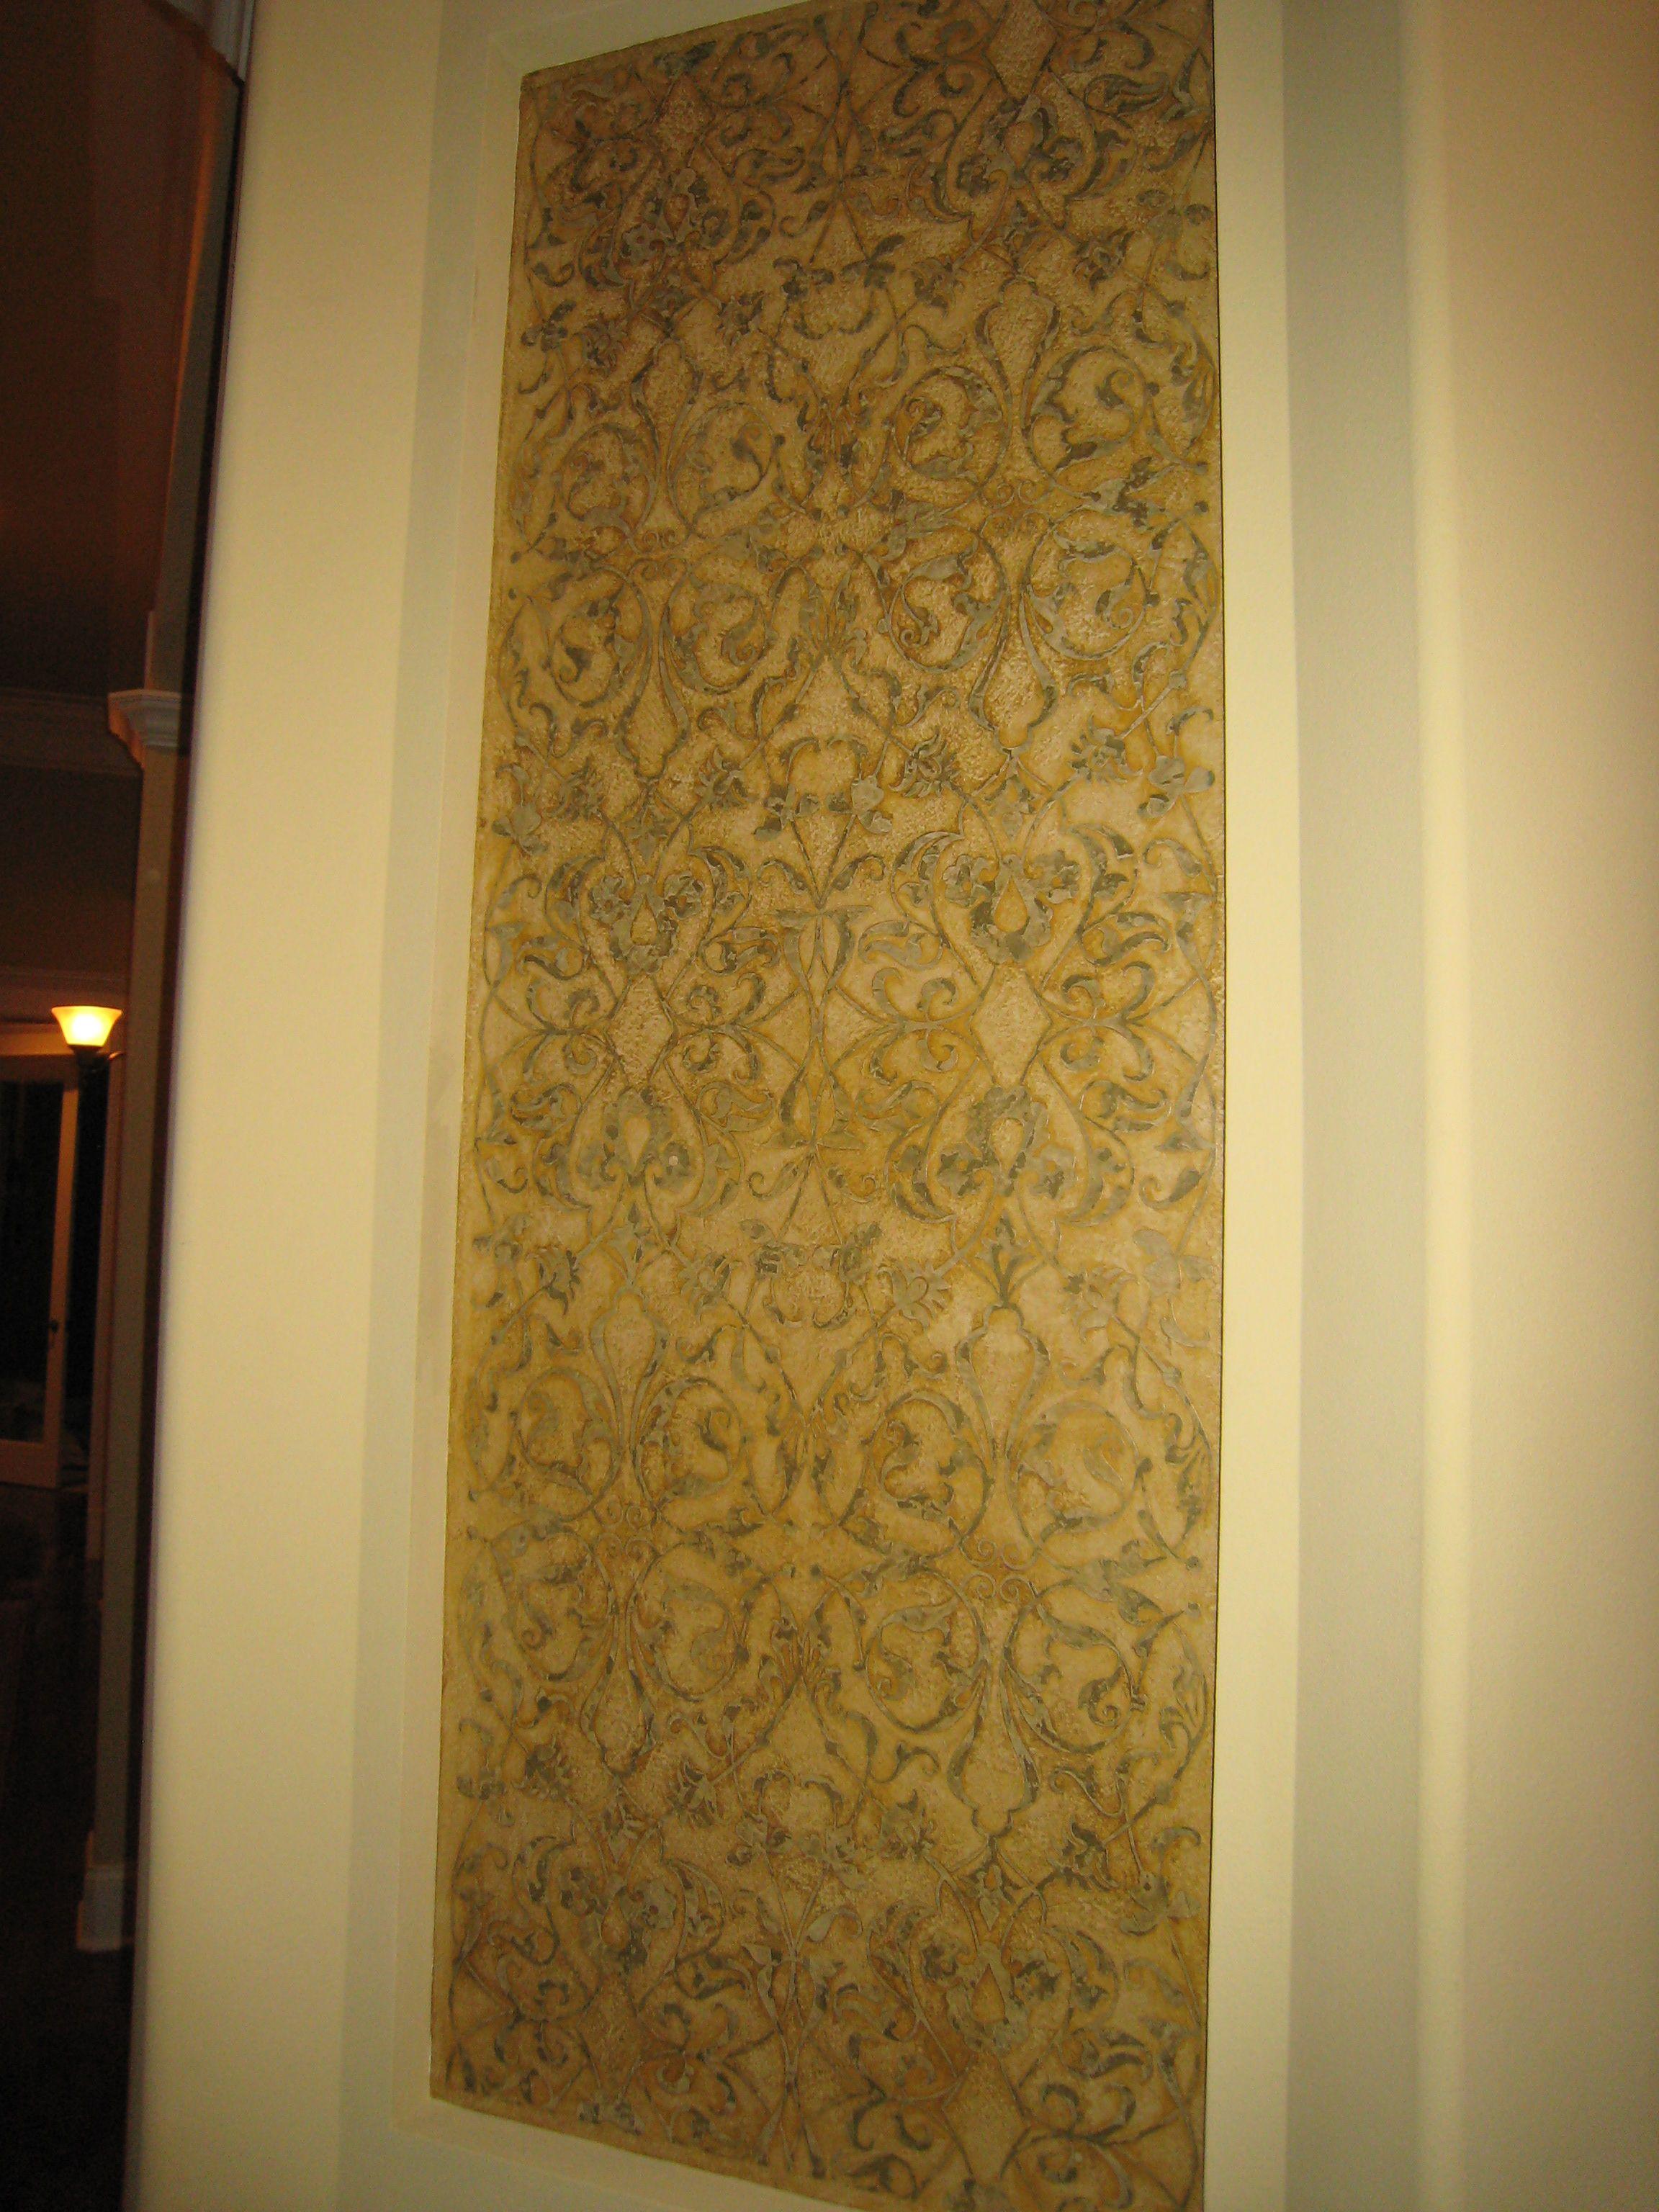 My work. Plaster and custom masking pattern